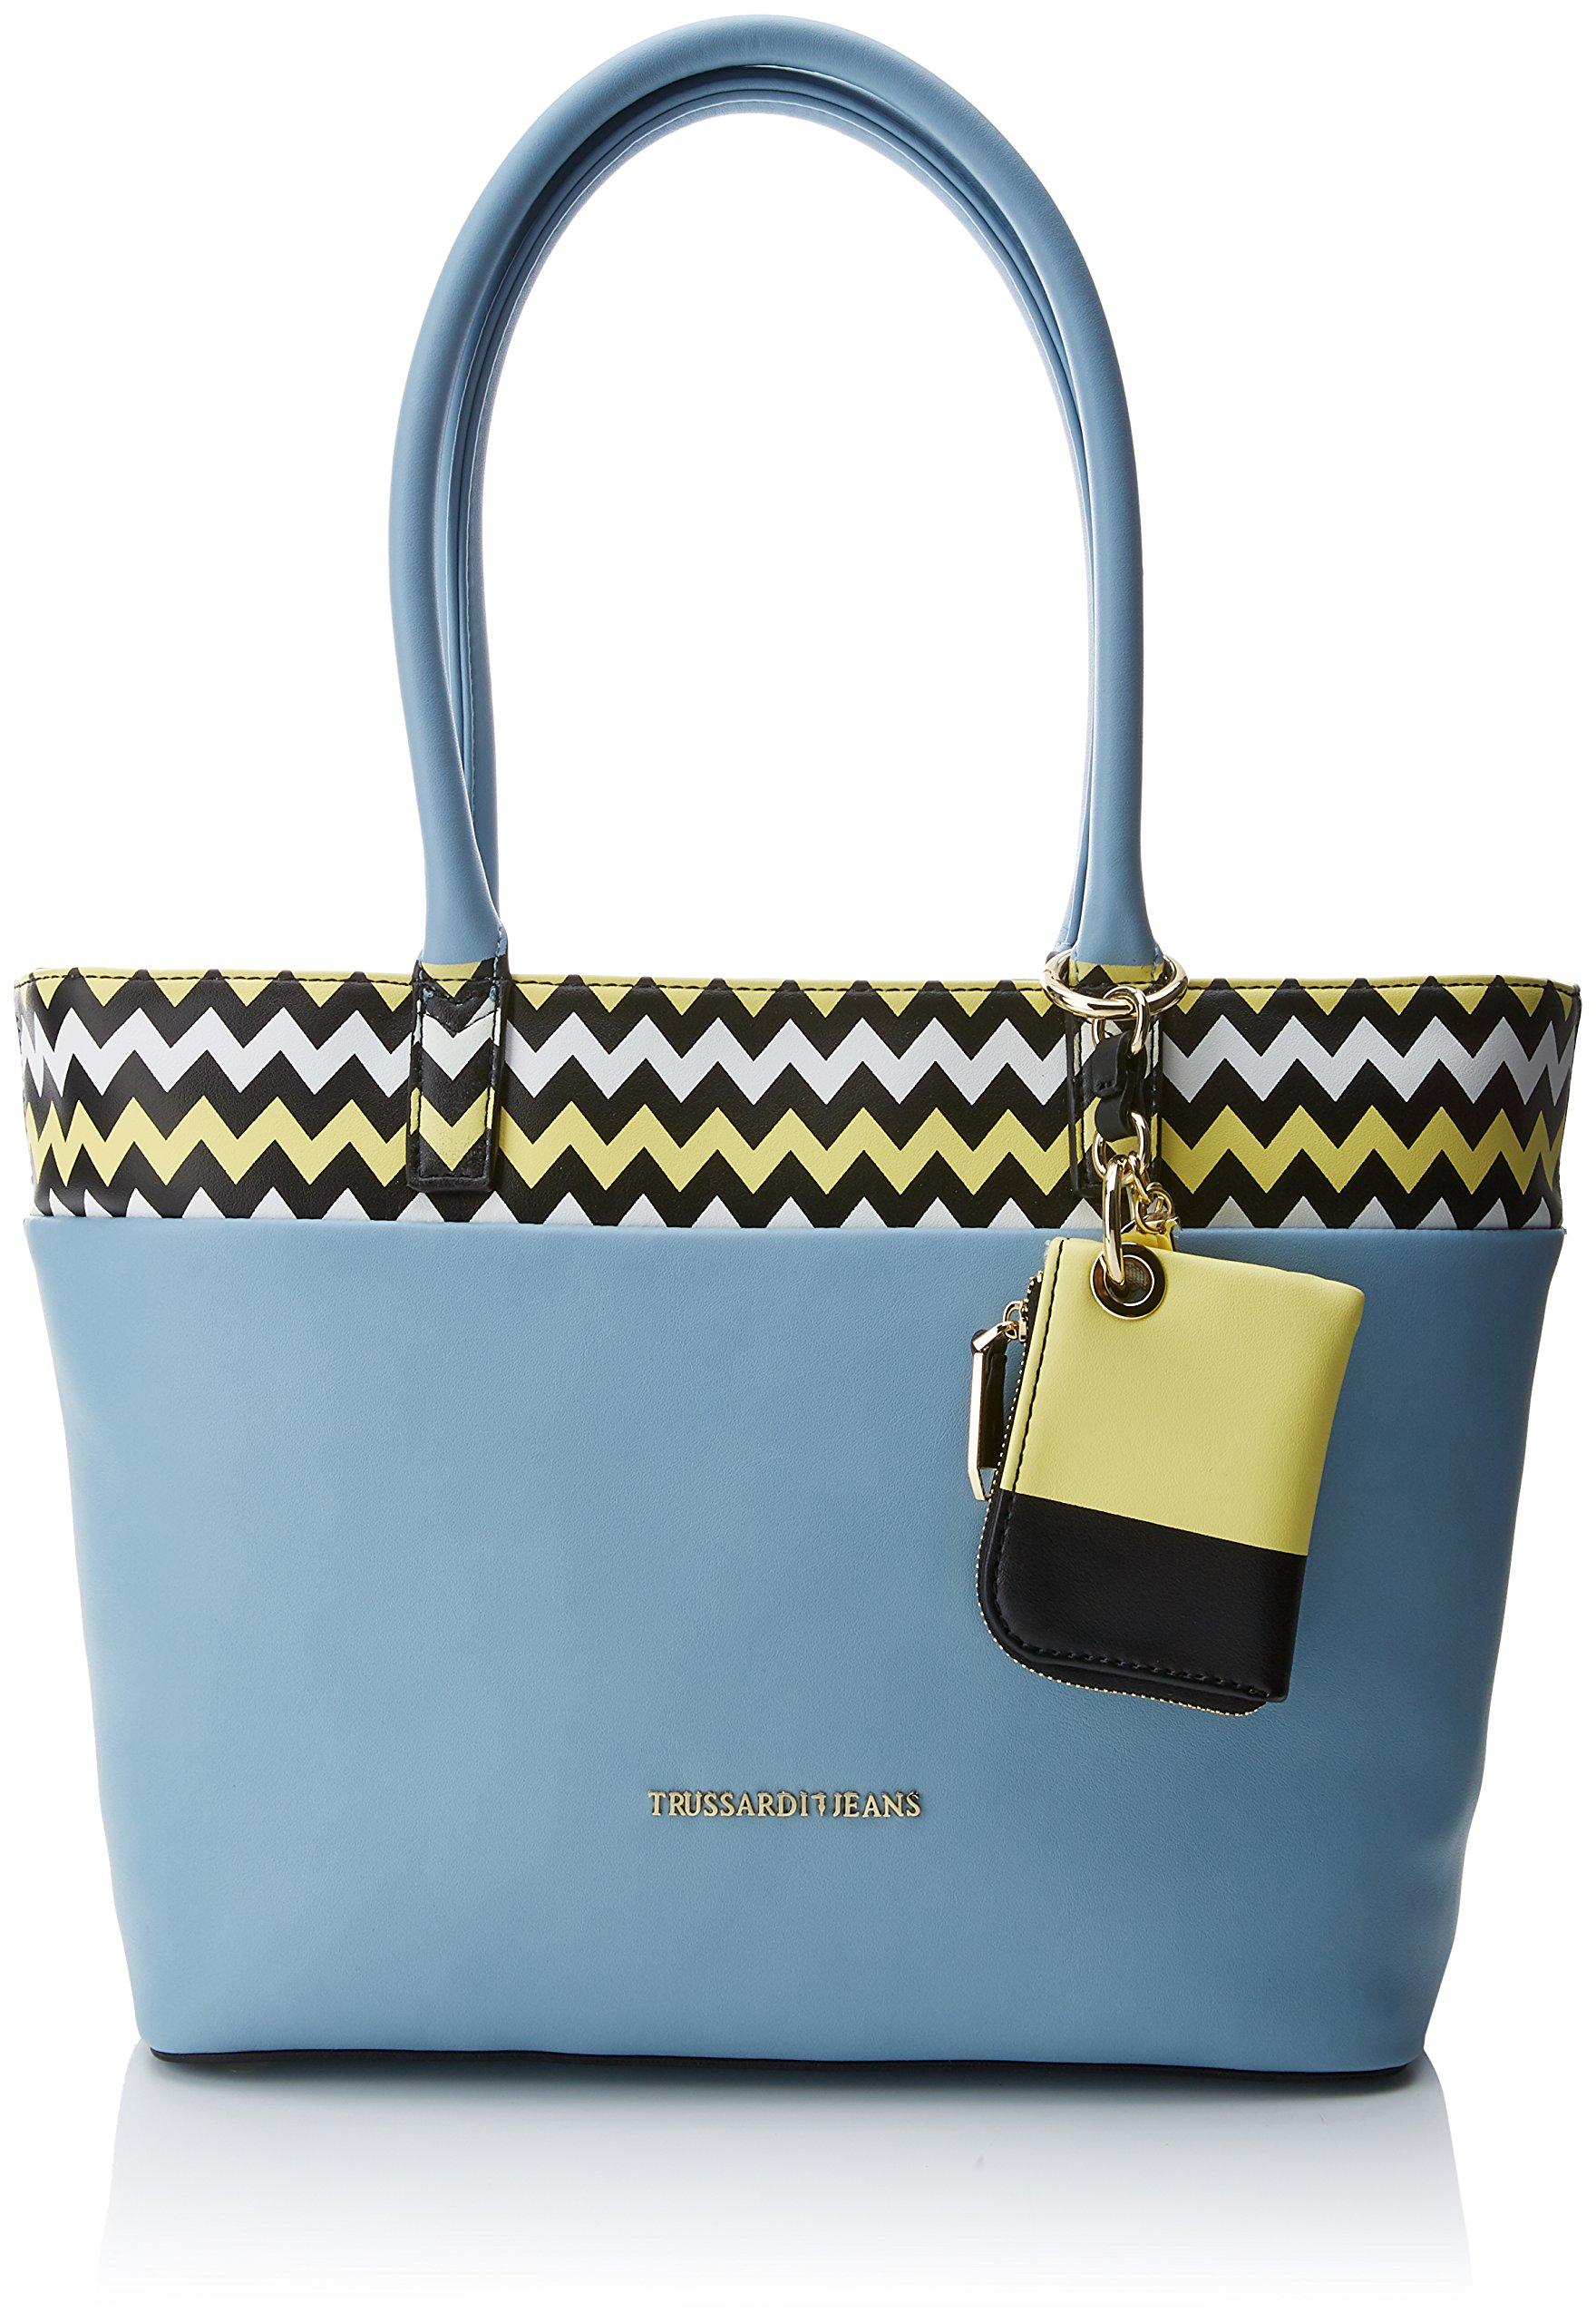 Trussardi FemmeBleulight Ecoleather Épaule H Portés Blue40x48x12 Jeans Smooth X L Shopping Holly Cmw BagSacs mw8Nvn0